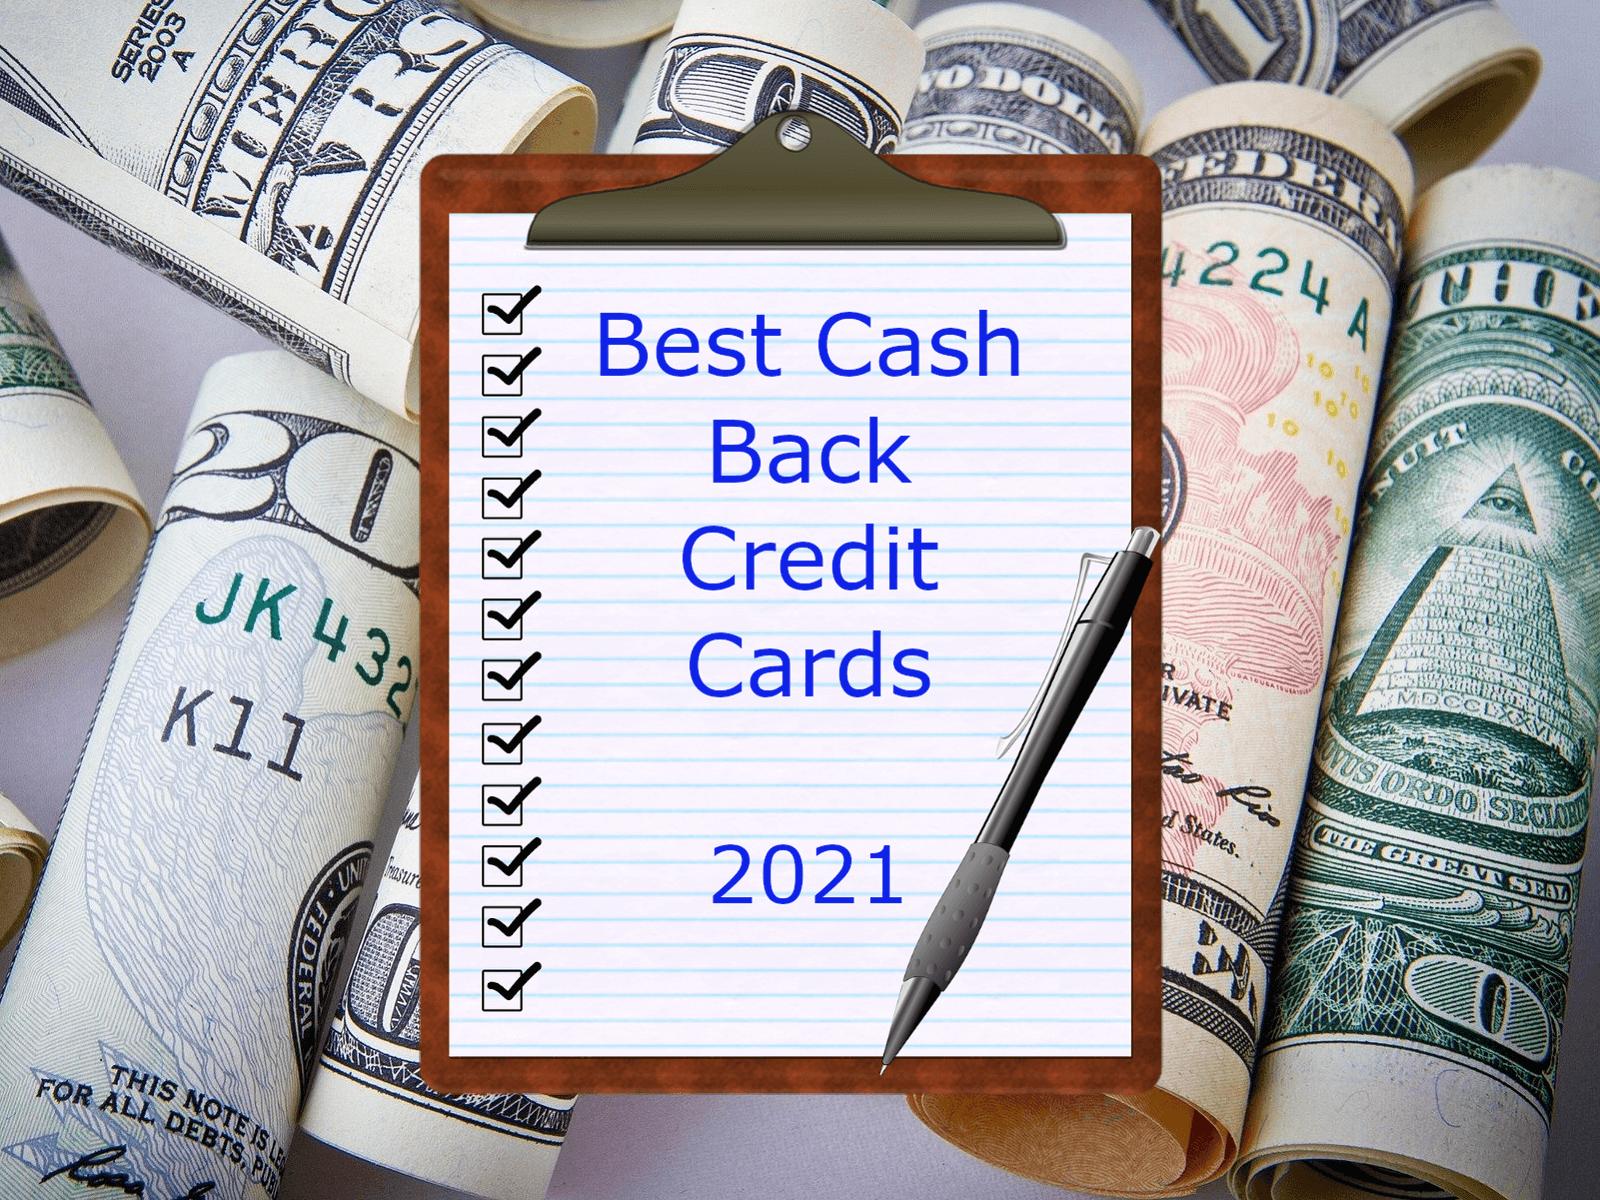 Best Cash Back Credit Cards (2021) - Top Travel on Points